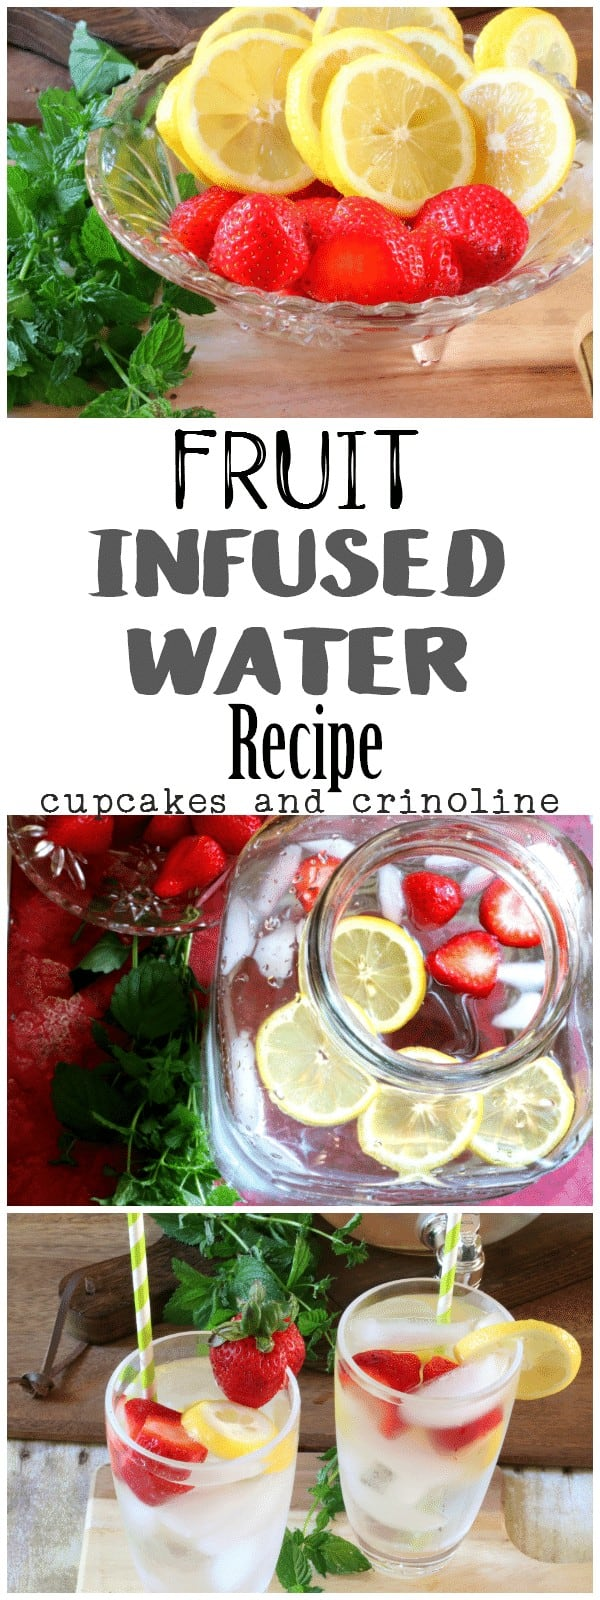 Fruit Infused Water Recipe from cupcakesandcrinoline.com